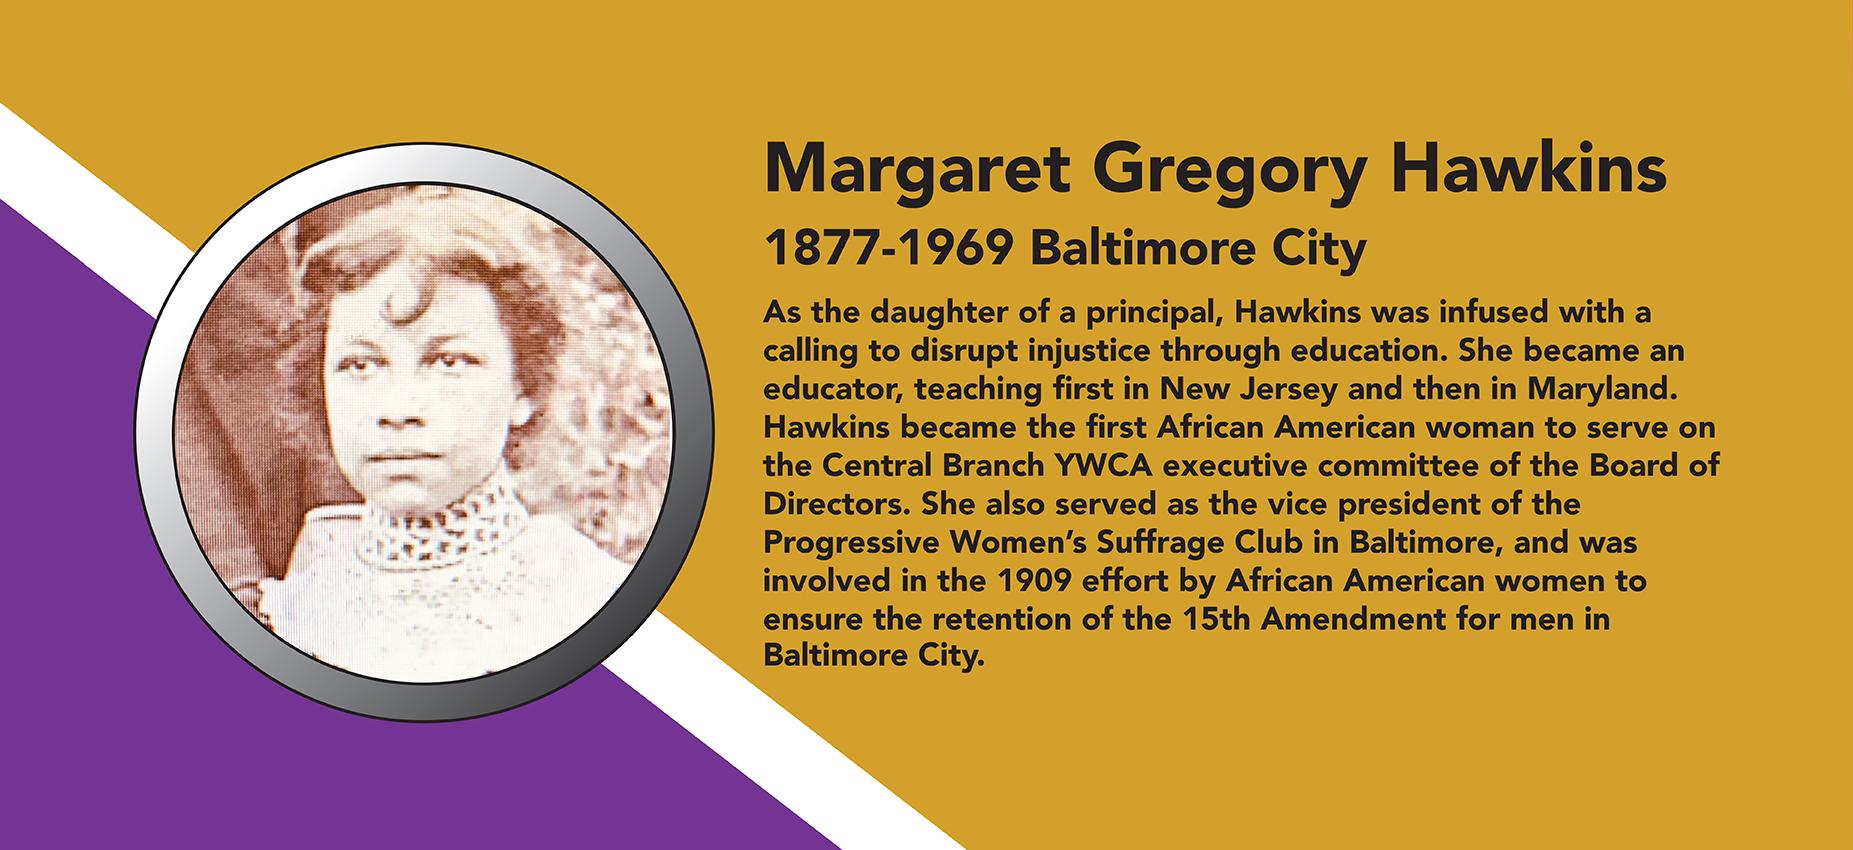 MargaretGregoryHawkins